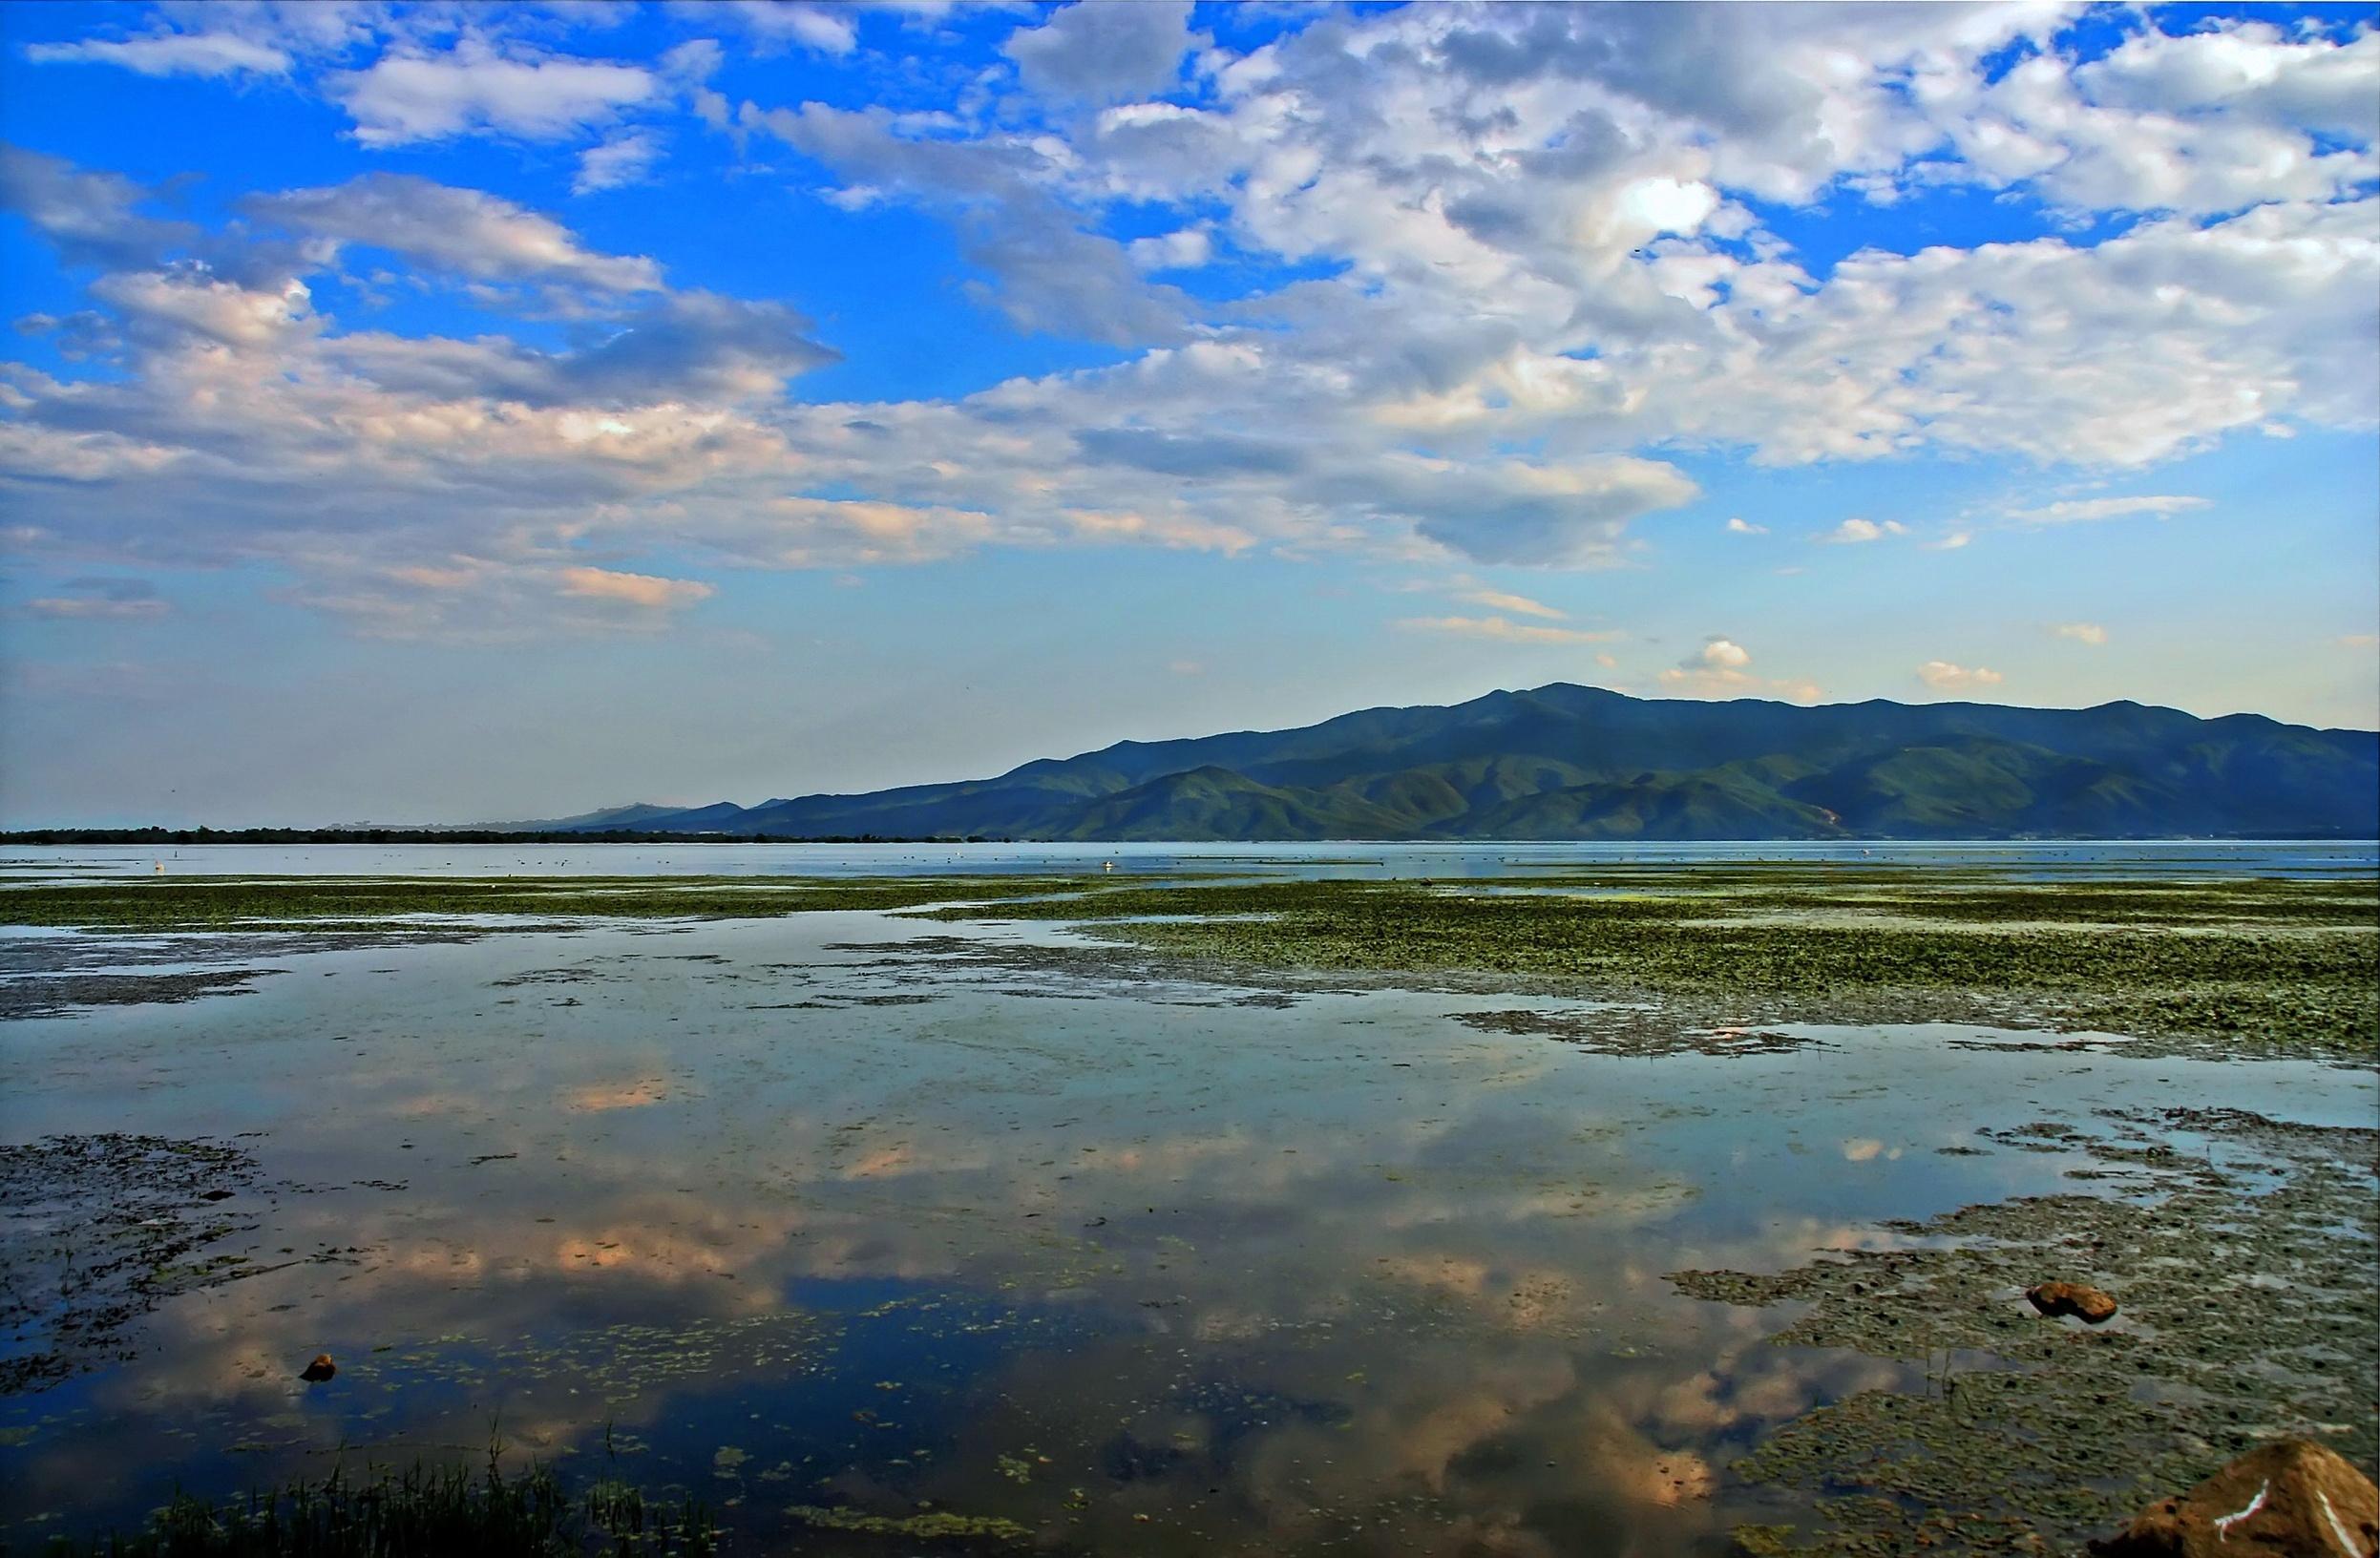 File:Kerkini lake 2.jpg - Wikimedia Commons